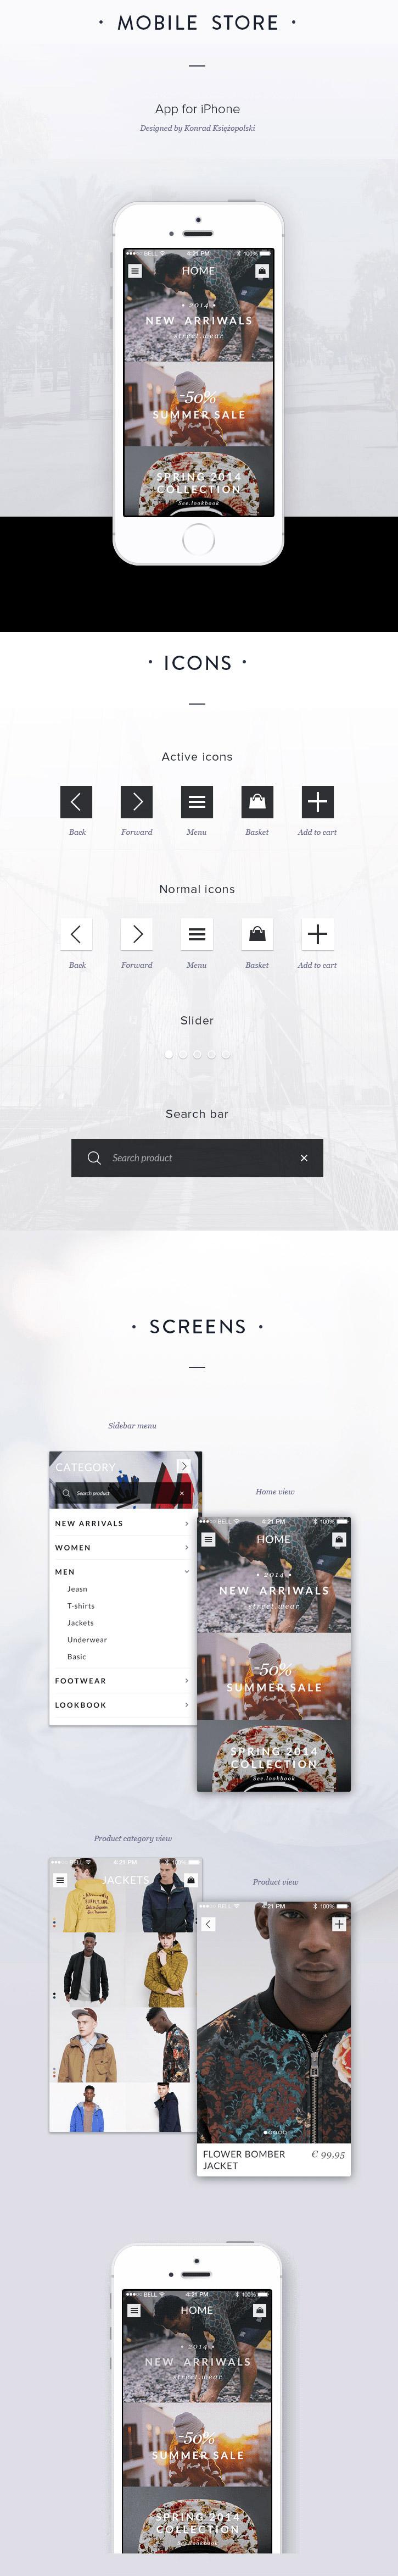 mobile-store-app-psd